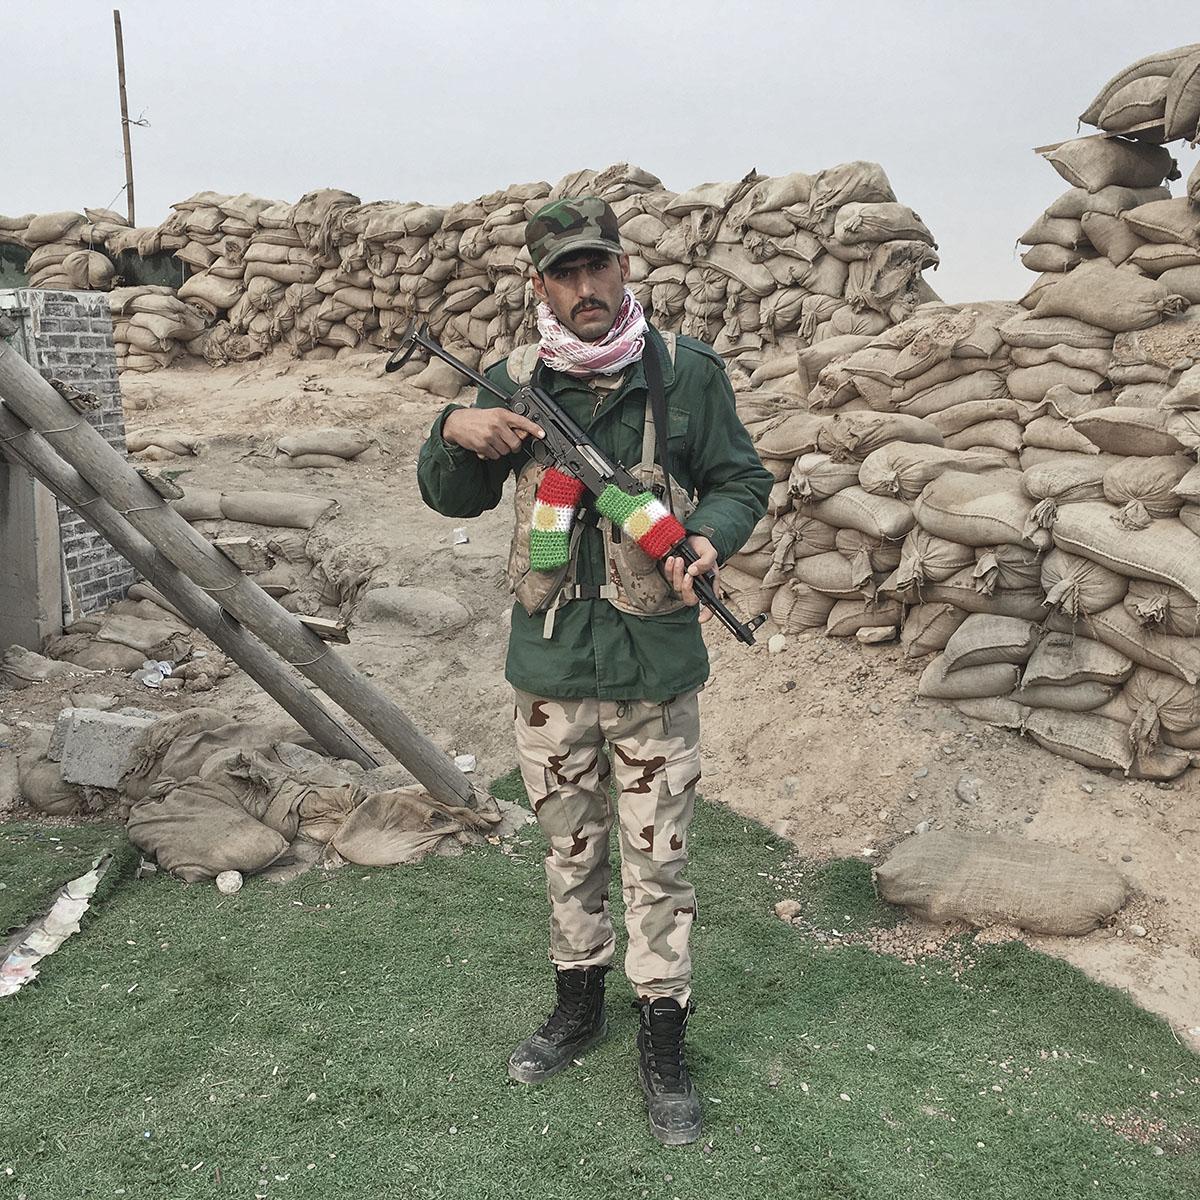 Hiwa Omar, 25, a Kurdish Peshmerga from Irbil, Iraq, guards a checkpoint in Gwer, southeast of Mosul, Iraq, Oct. 24, 2016.